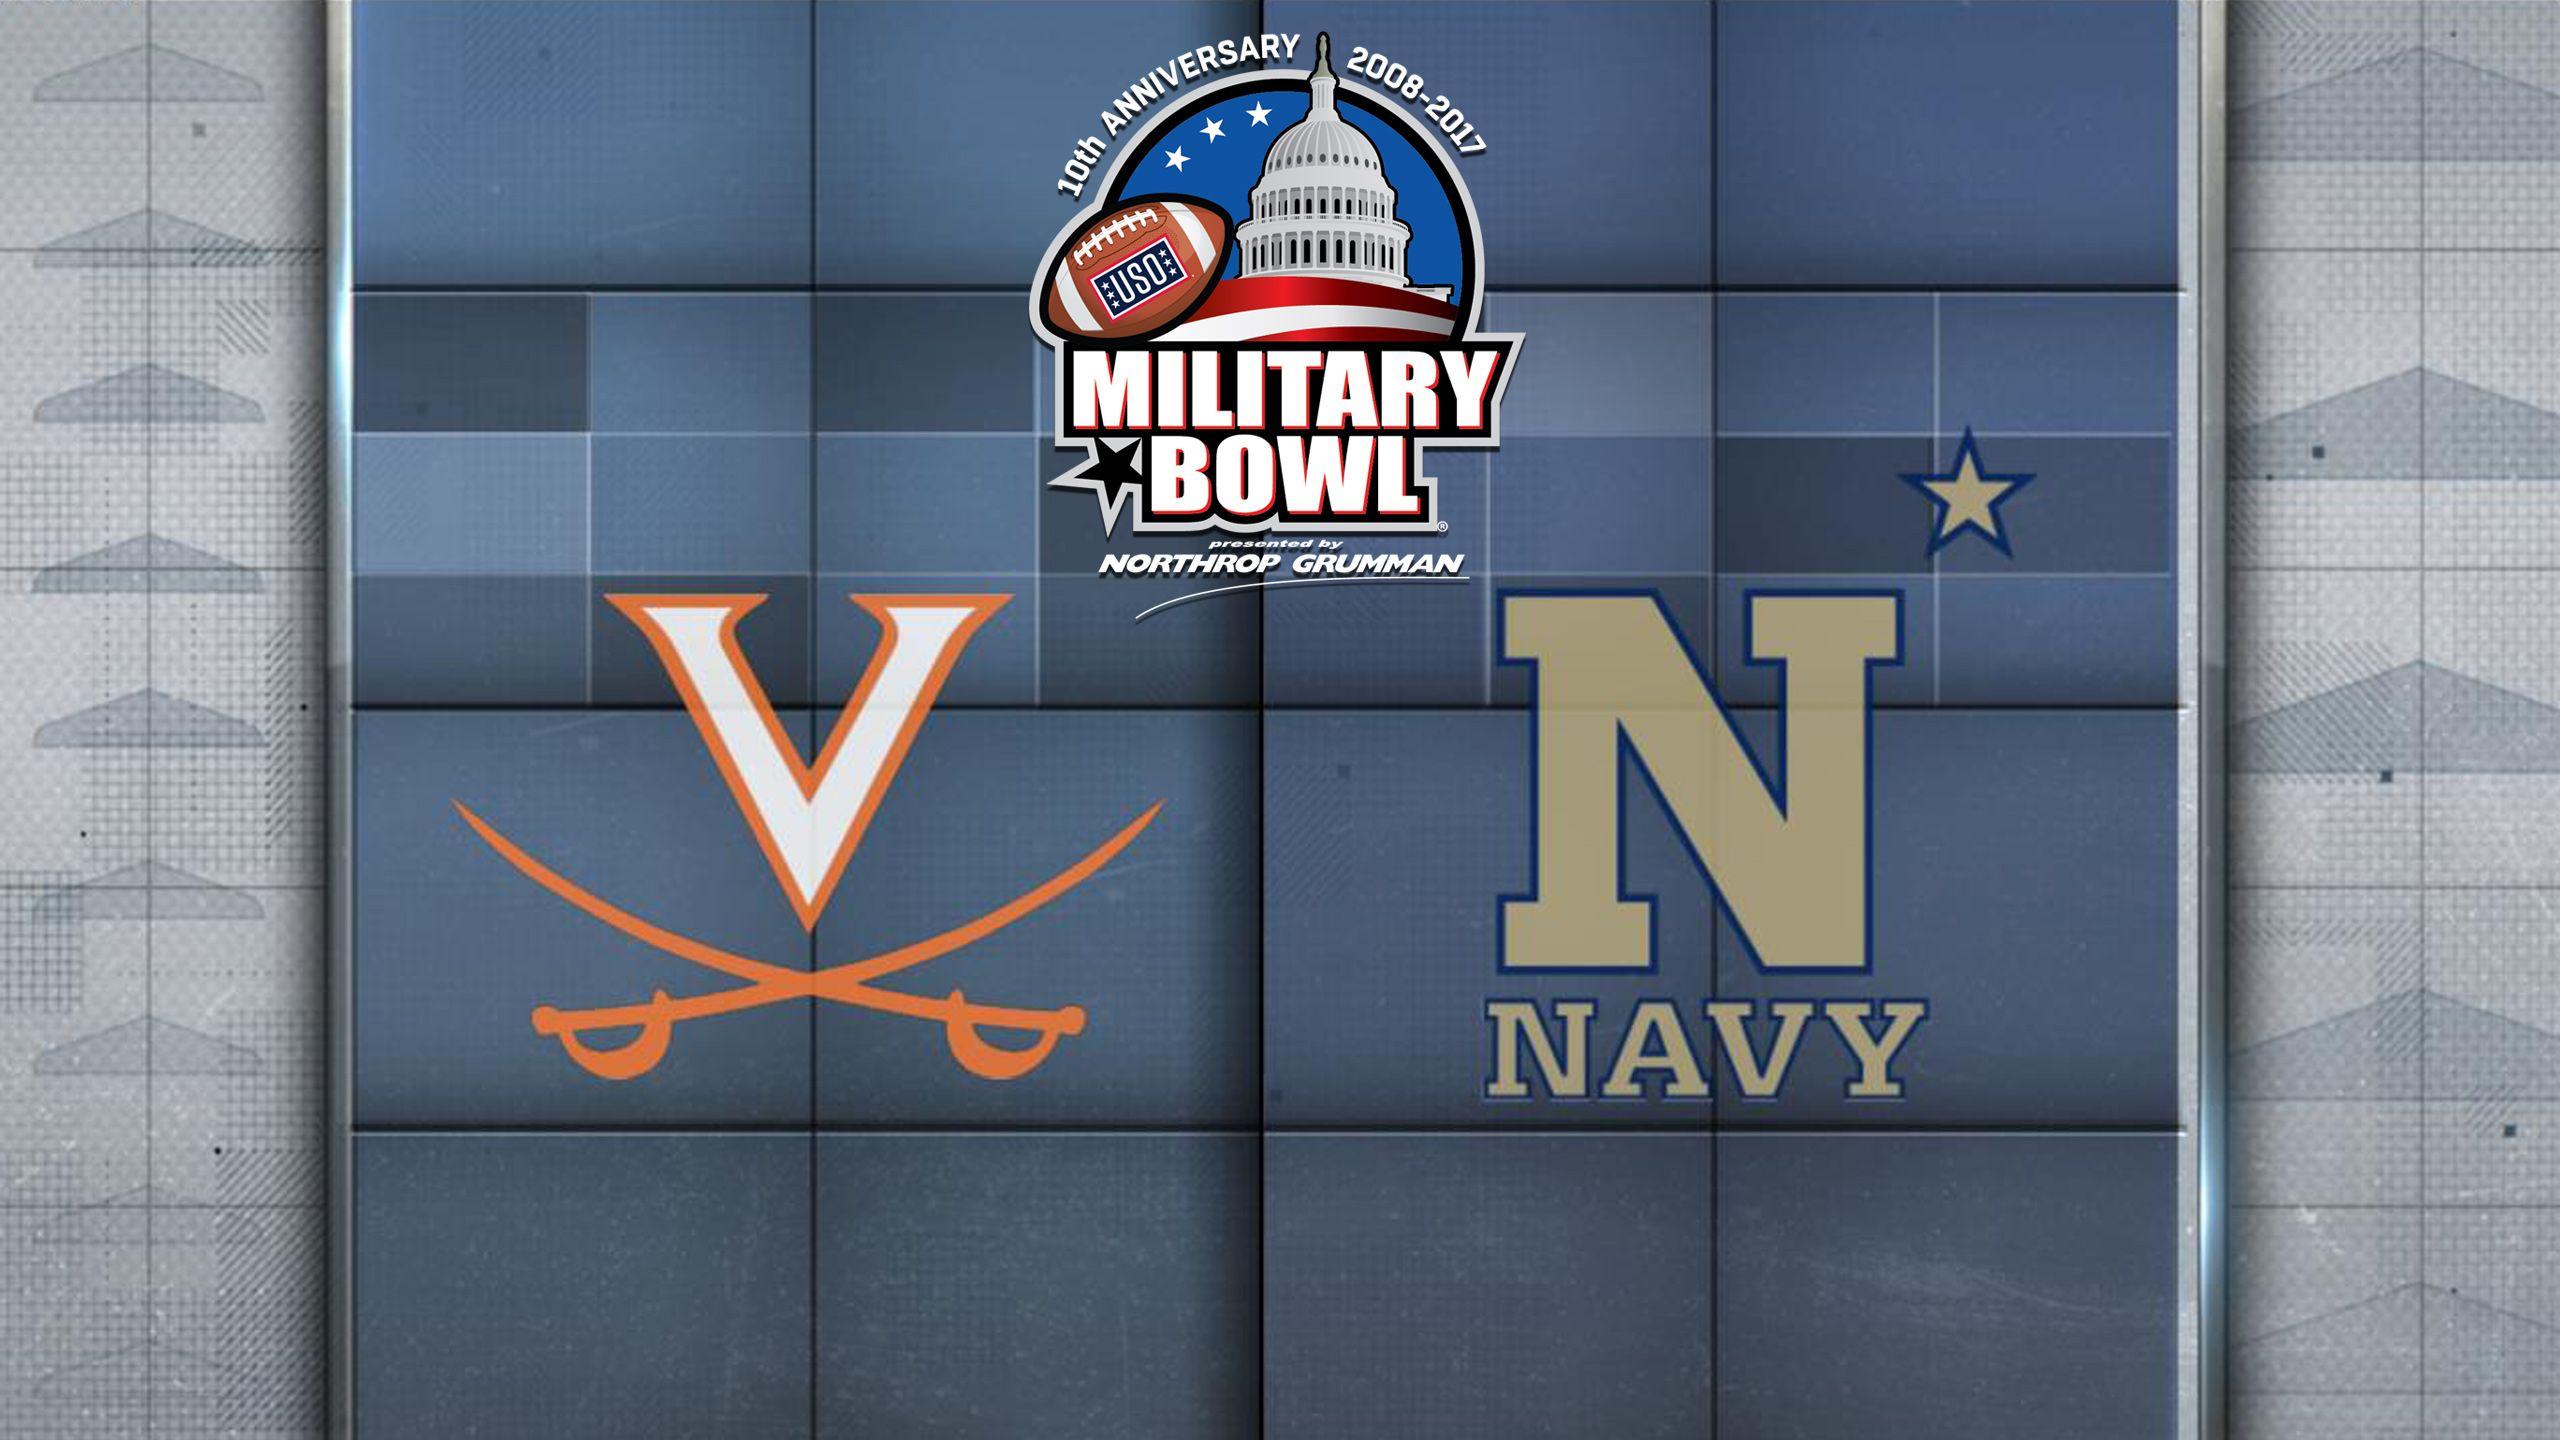 Virginia vs. Navy (Military Bowl)